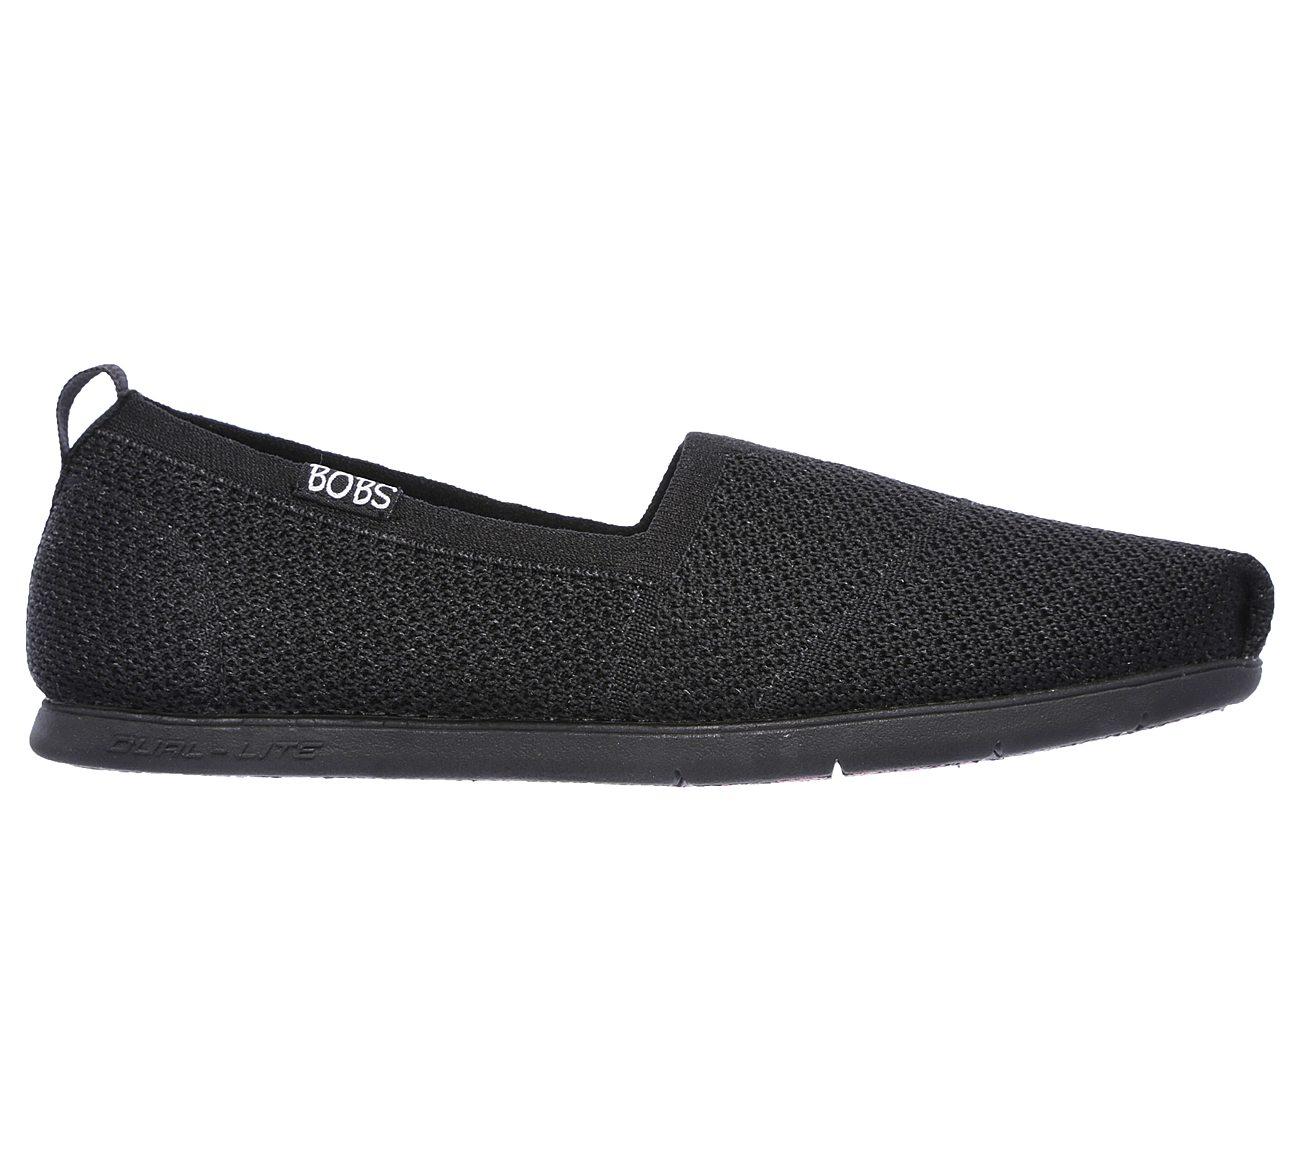 Skechers Bobs from Women's Plush Lite-be Cool Flat, Gray/Multi, 6.5 M US